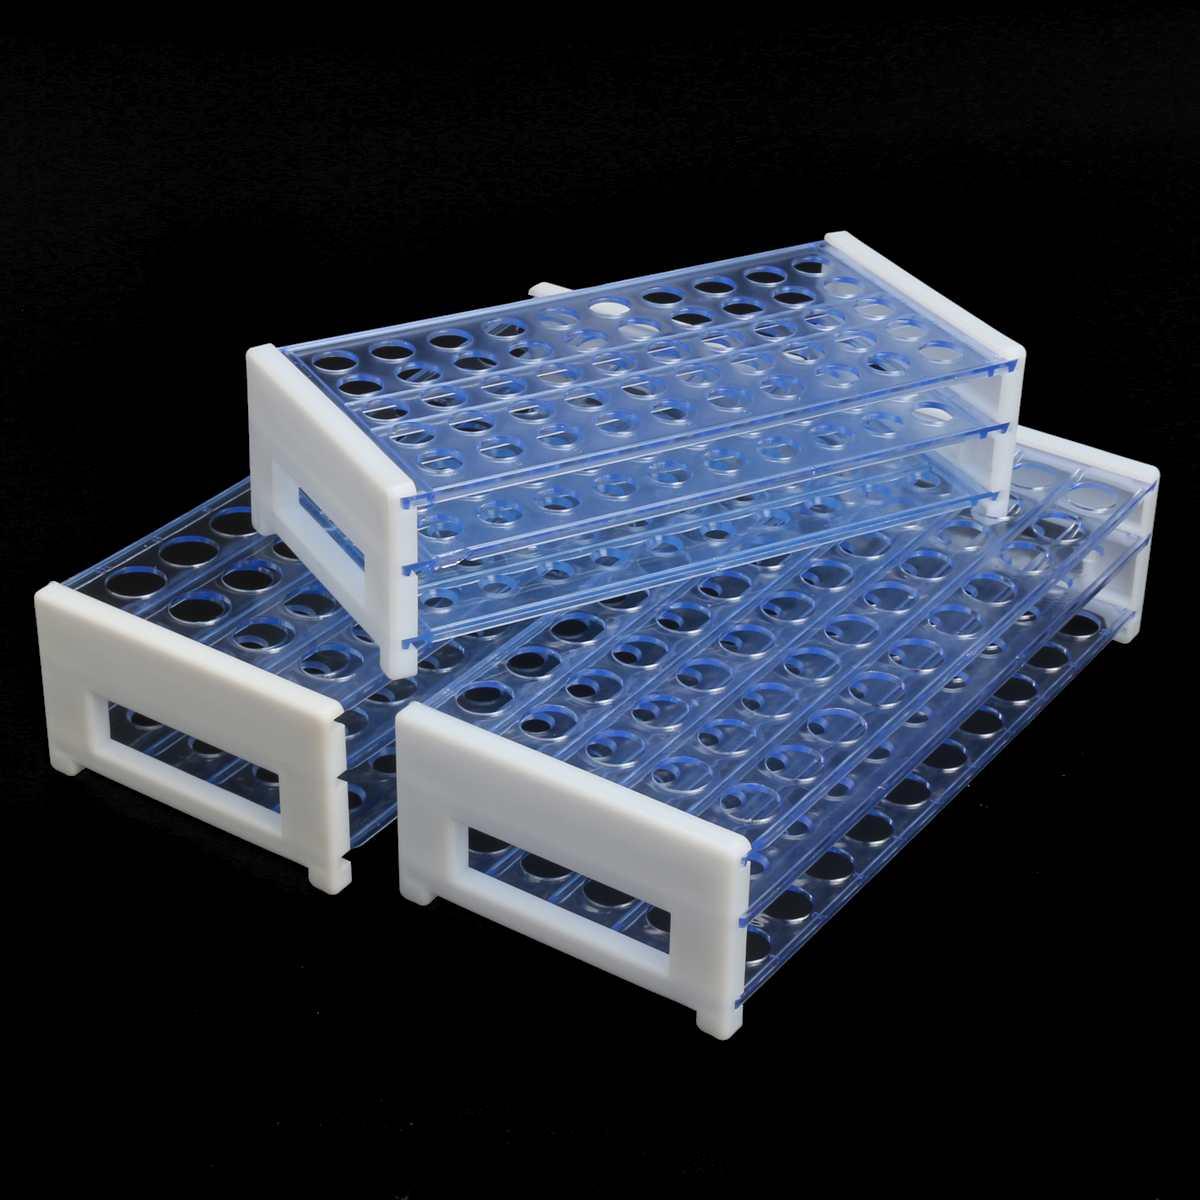 13/16/18mm Clear Plastic 3 Layers Lab Test Tube Storage Rack Centrifugal Test Tubing Rack Holder School Lab Equipment 40/50 Hole